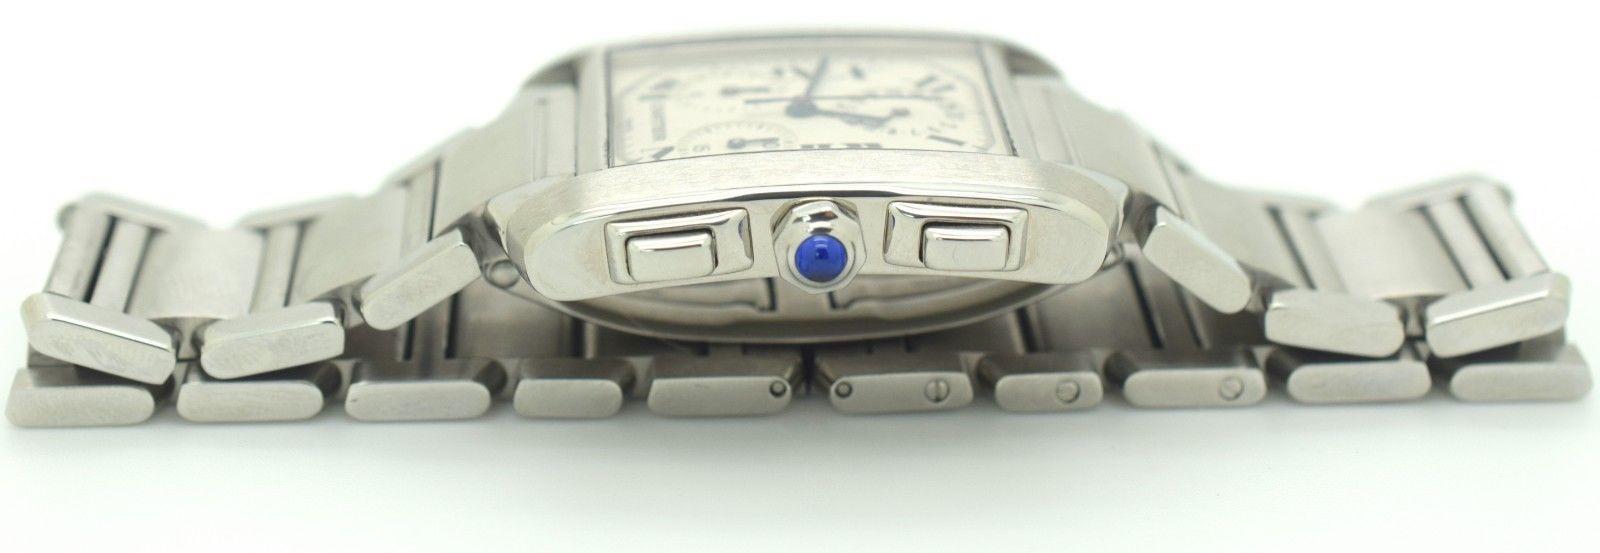 Cartier Tank Francaise 2303 Swiss Quartz Chronograph Stainless Steel Watch